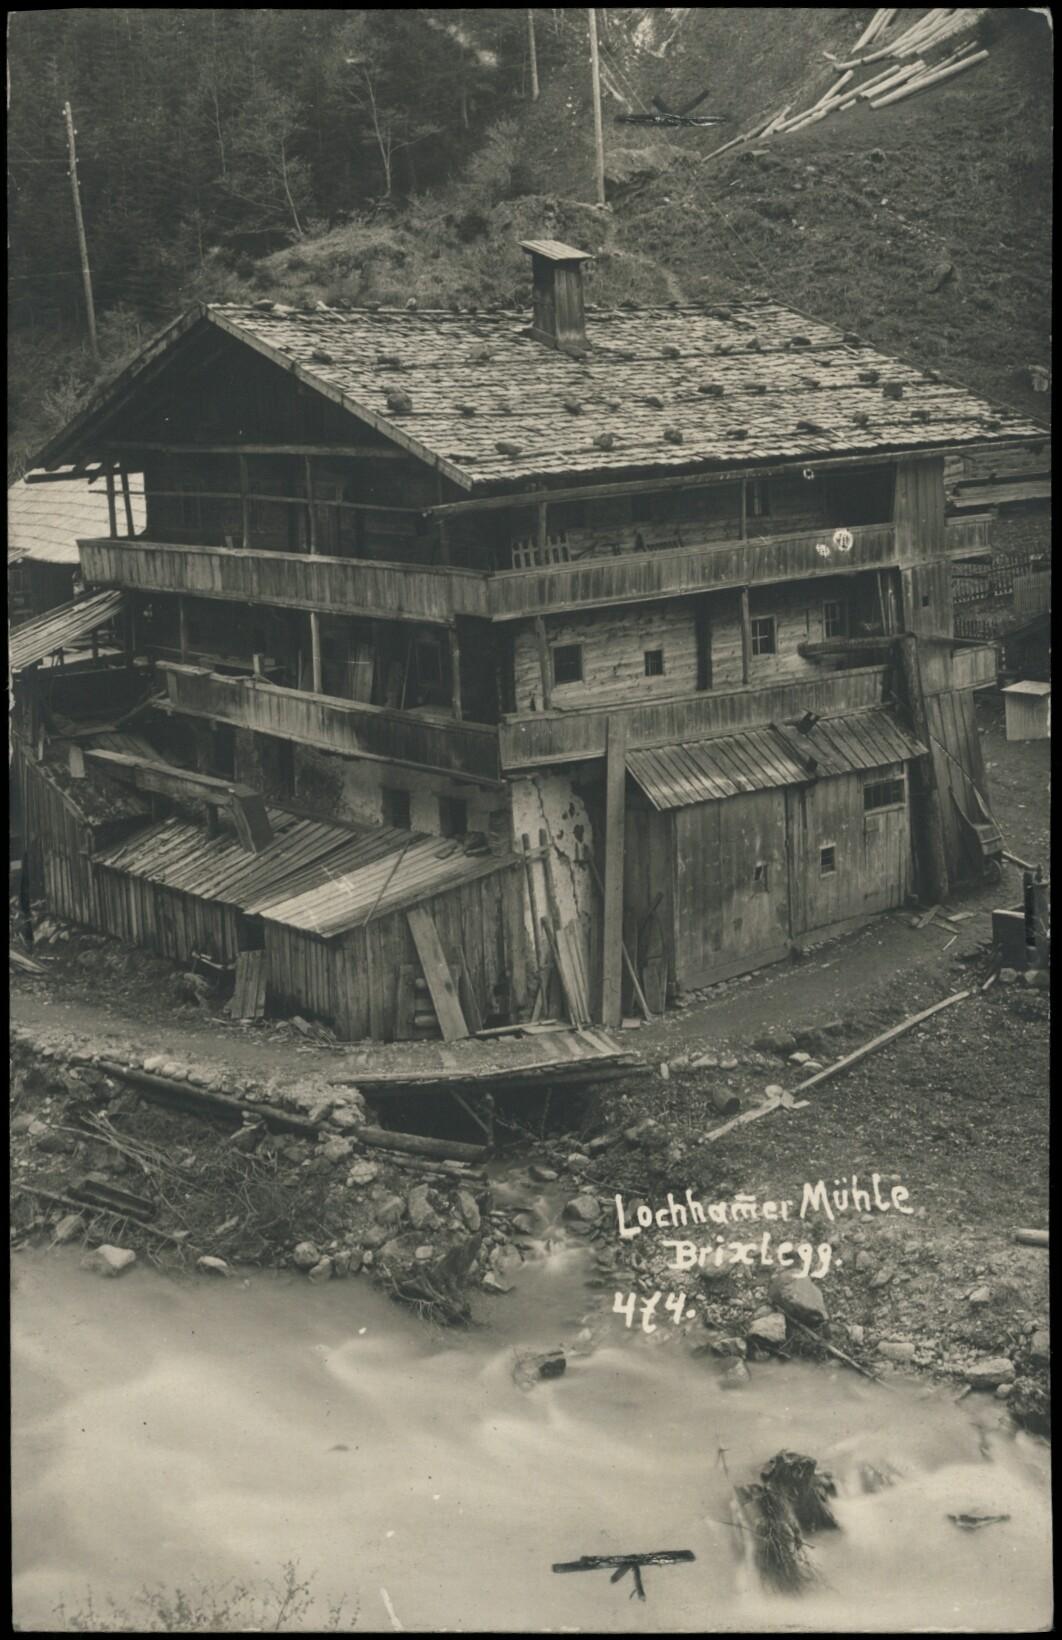 Brixlegg Lochhamer Mühle